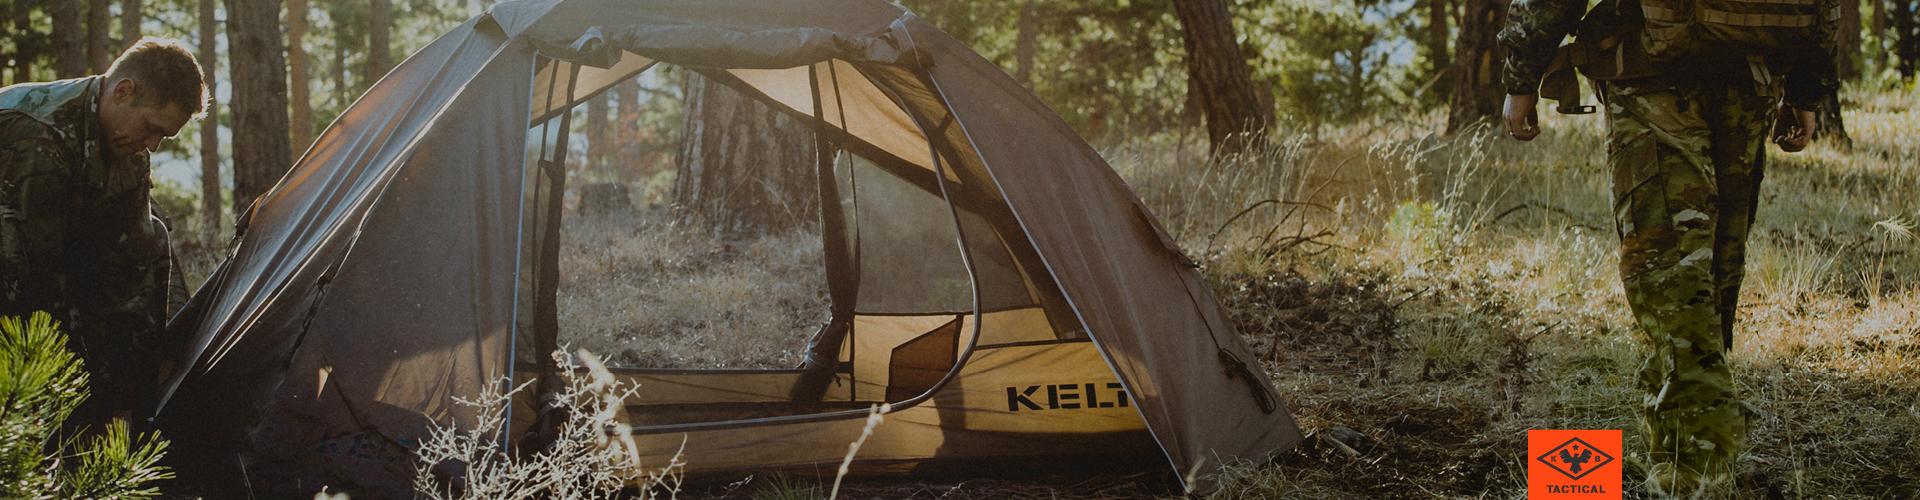 kl-militarypageupdate-tents2.jpg